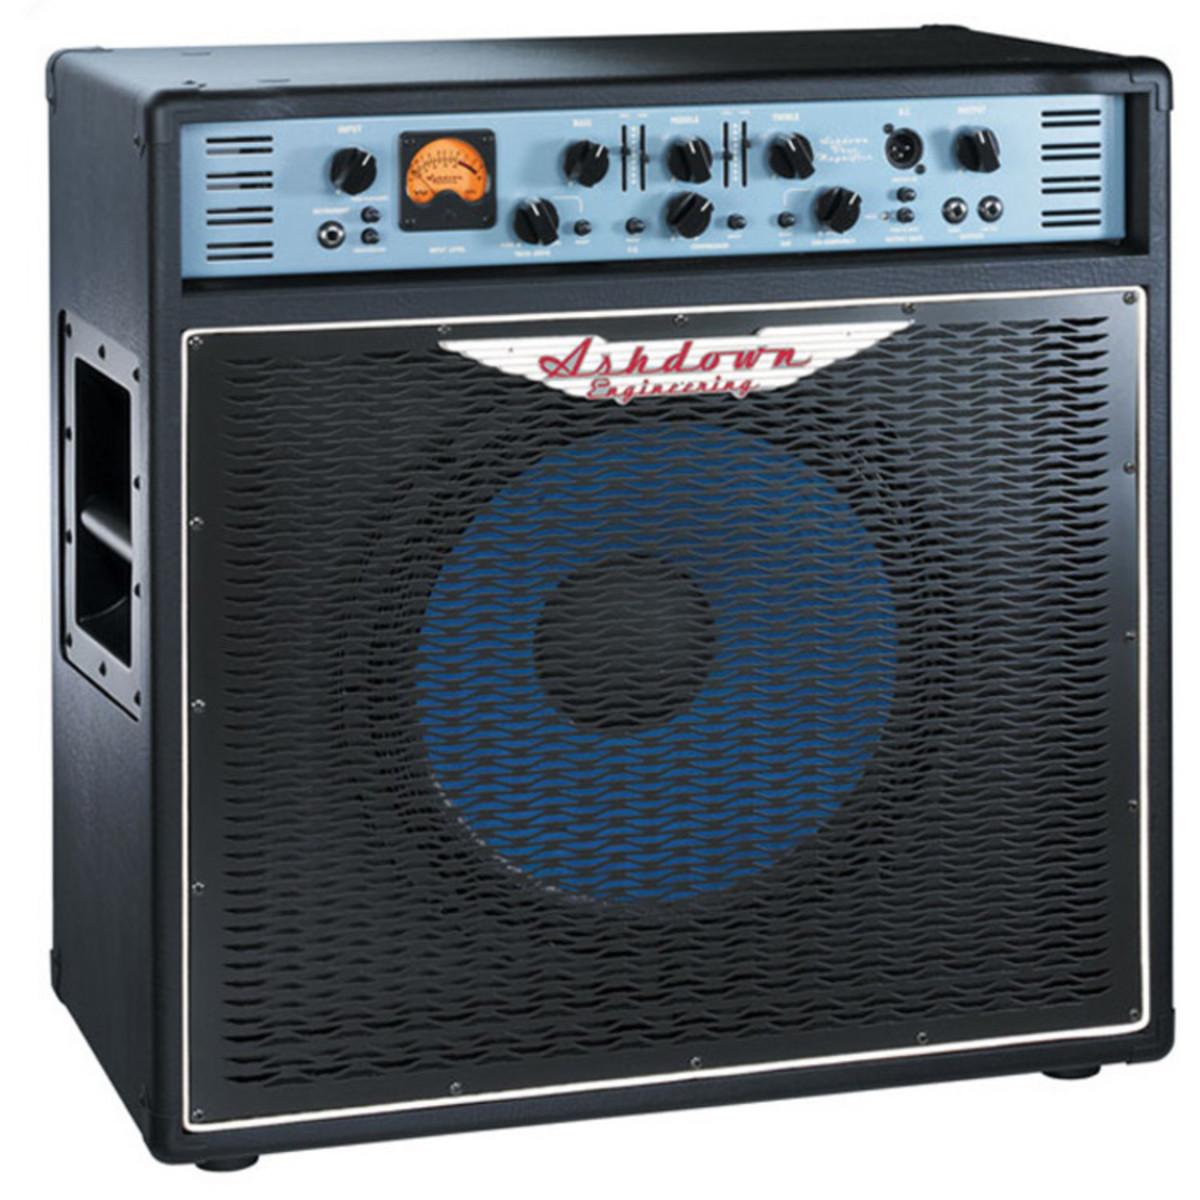 Ashdown Bass Amp : discontinued ashdown abm c115 500 bass combo amp at ~ Russianpoet.info Haus und Dekorationen